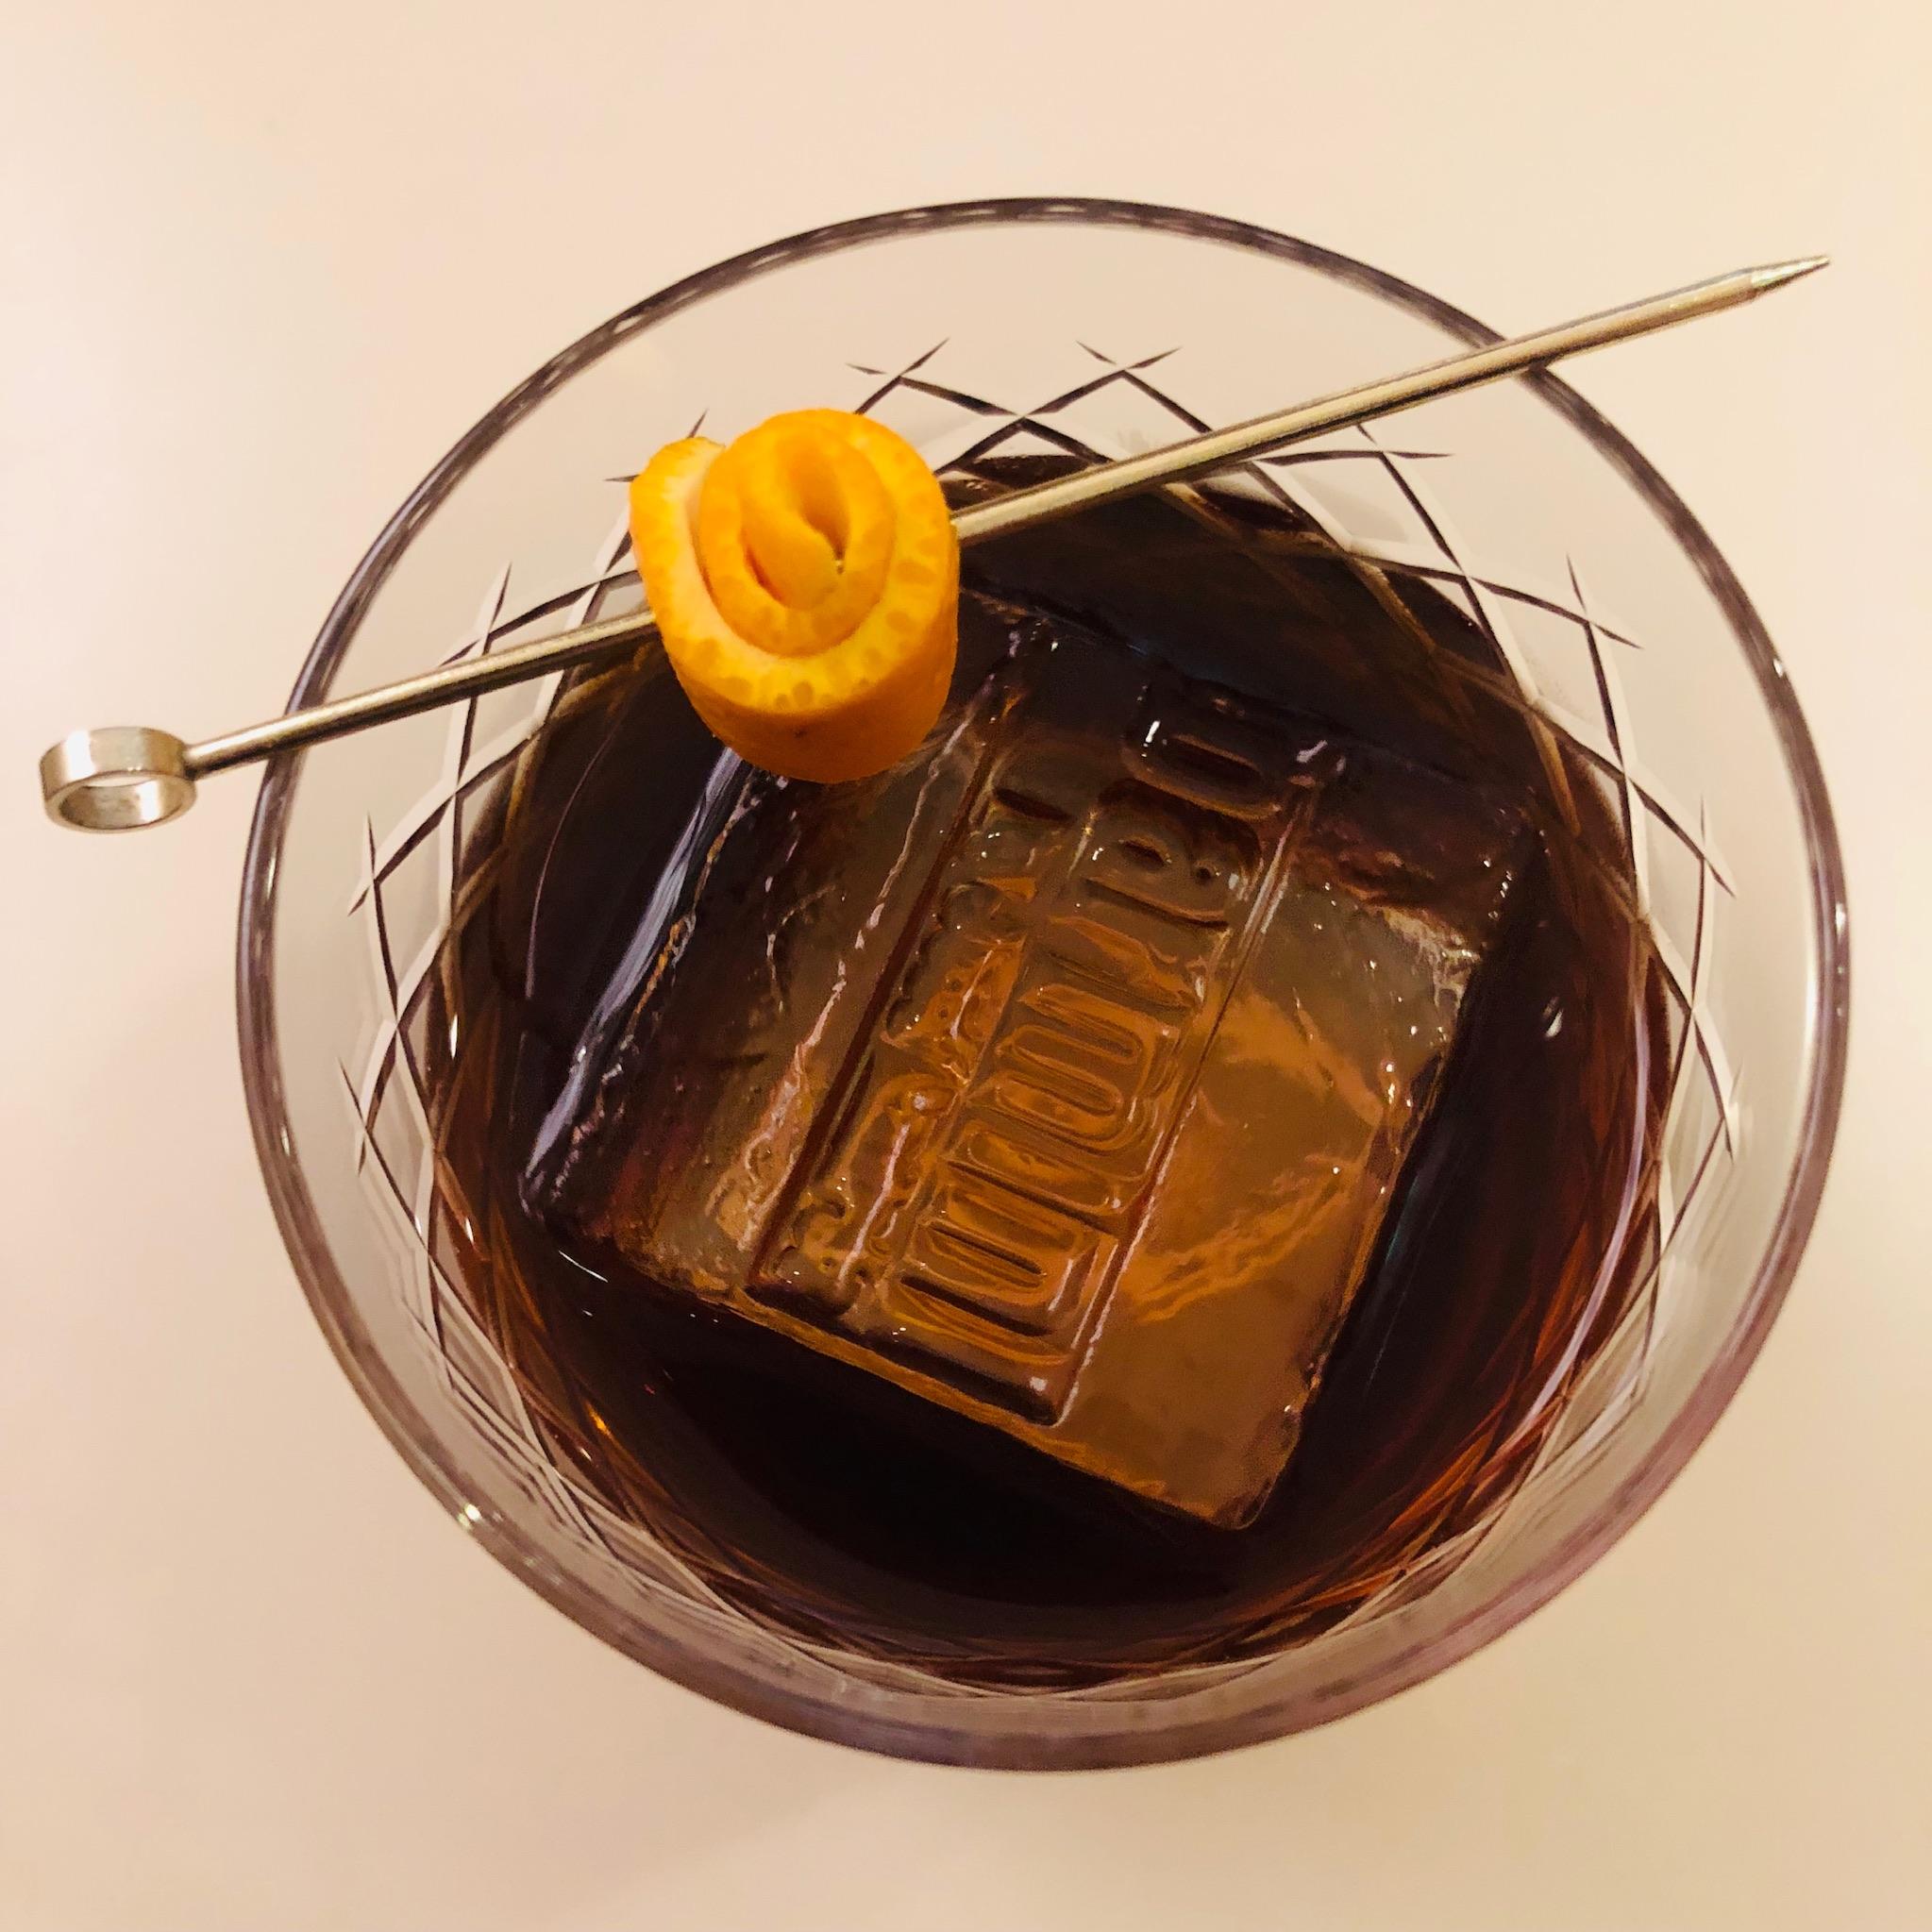 Photo_BarMini_Cocktail.jpg